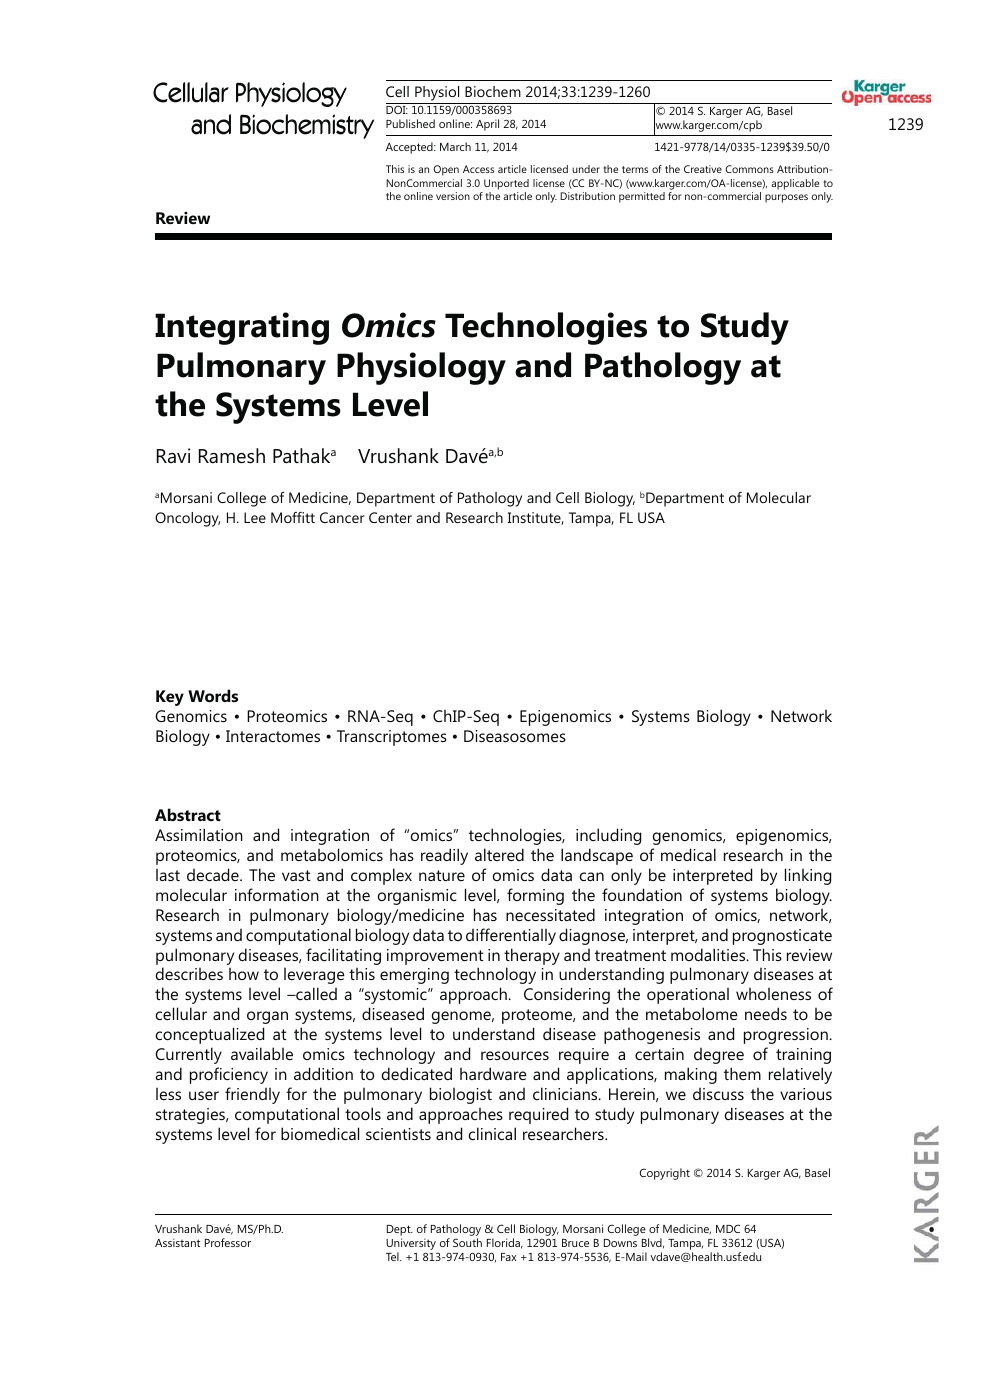 Integrating Omics Technologies to Study Pulmonary Physiology